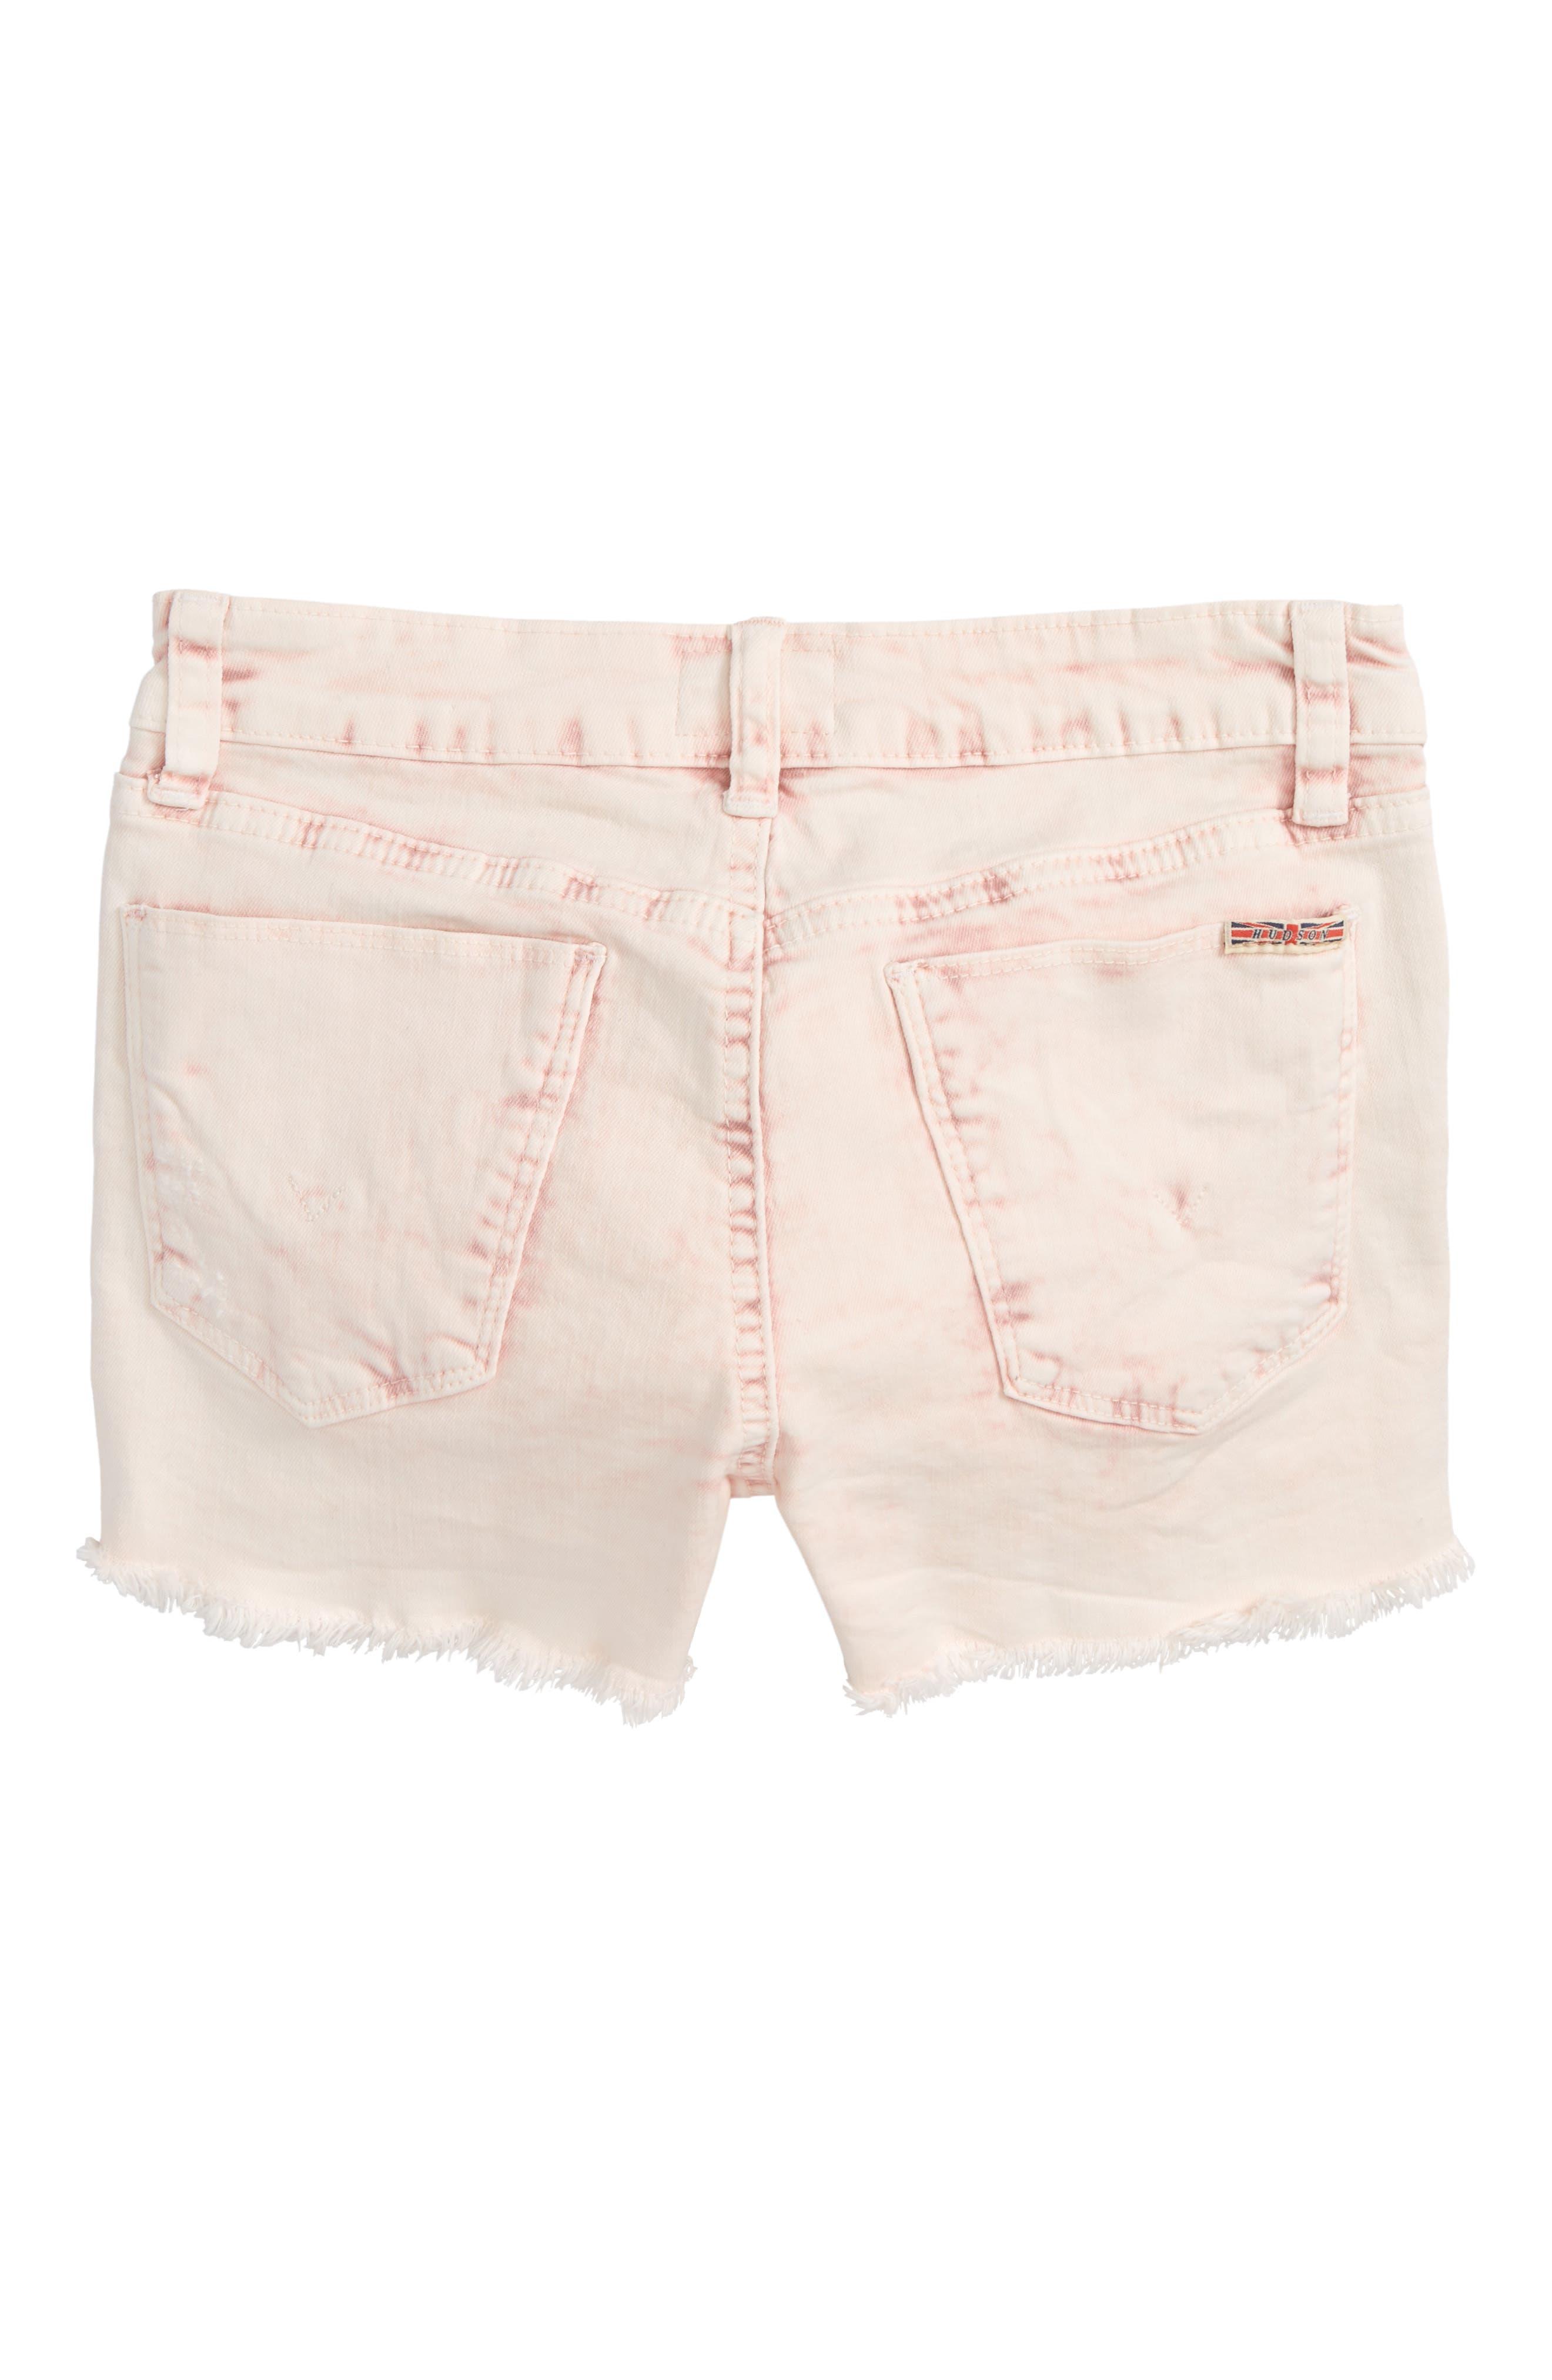 Frayed Acid Wash Shorts,                             Alternate thumbnail 2, color,                             Pink Coral Acid Wash